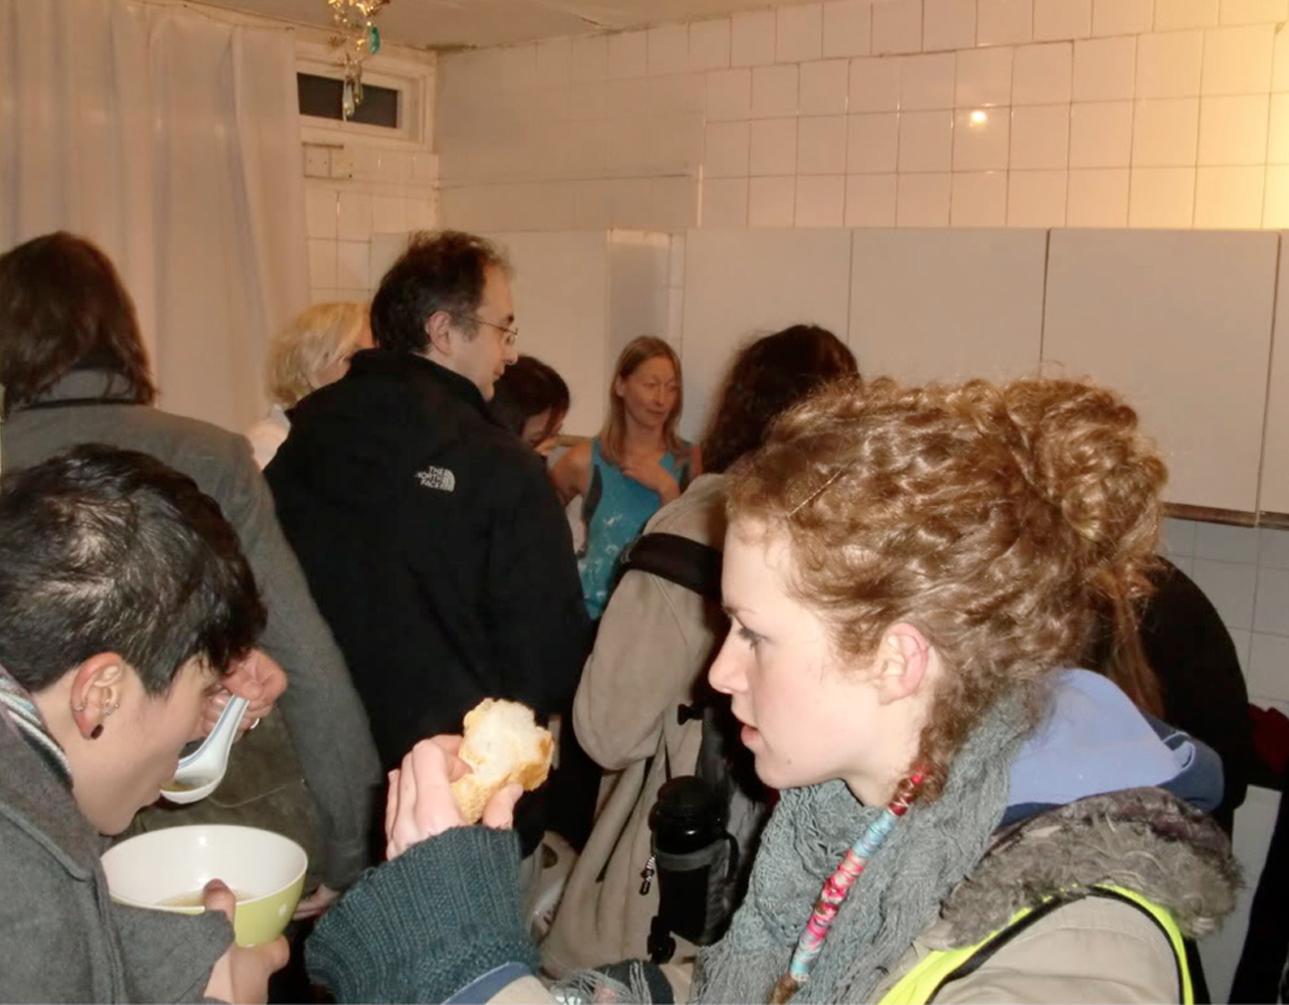 soup kitchen people.jpg